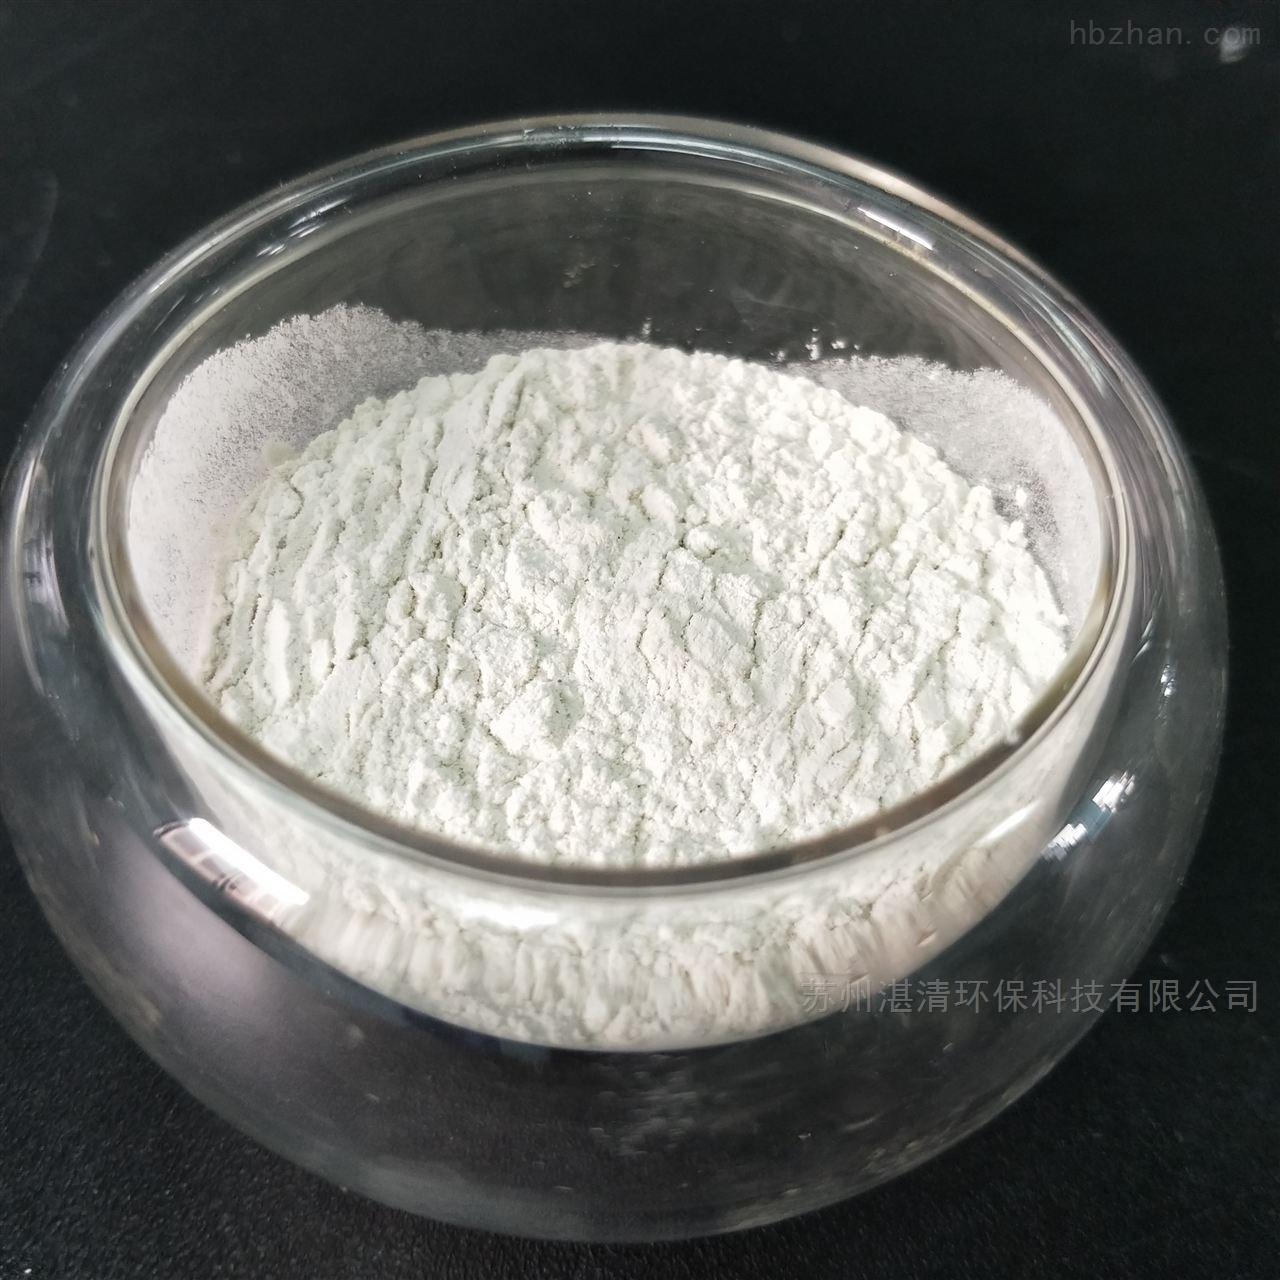 AG體育環保使用說明-次亞磷去除劑HMC-P3